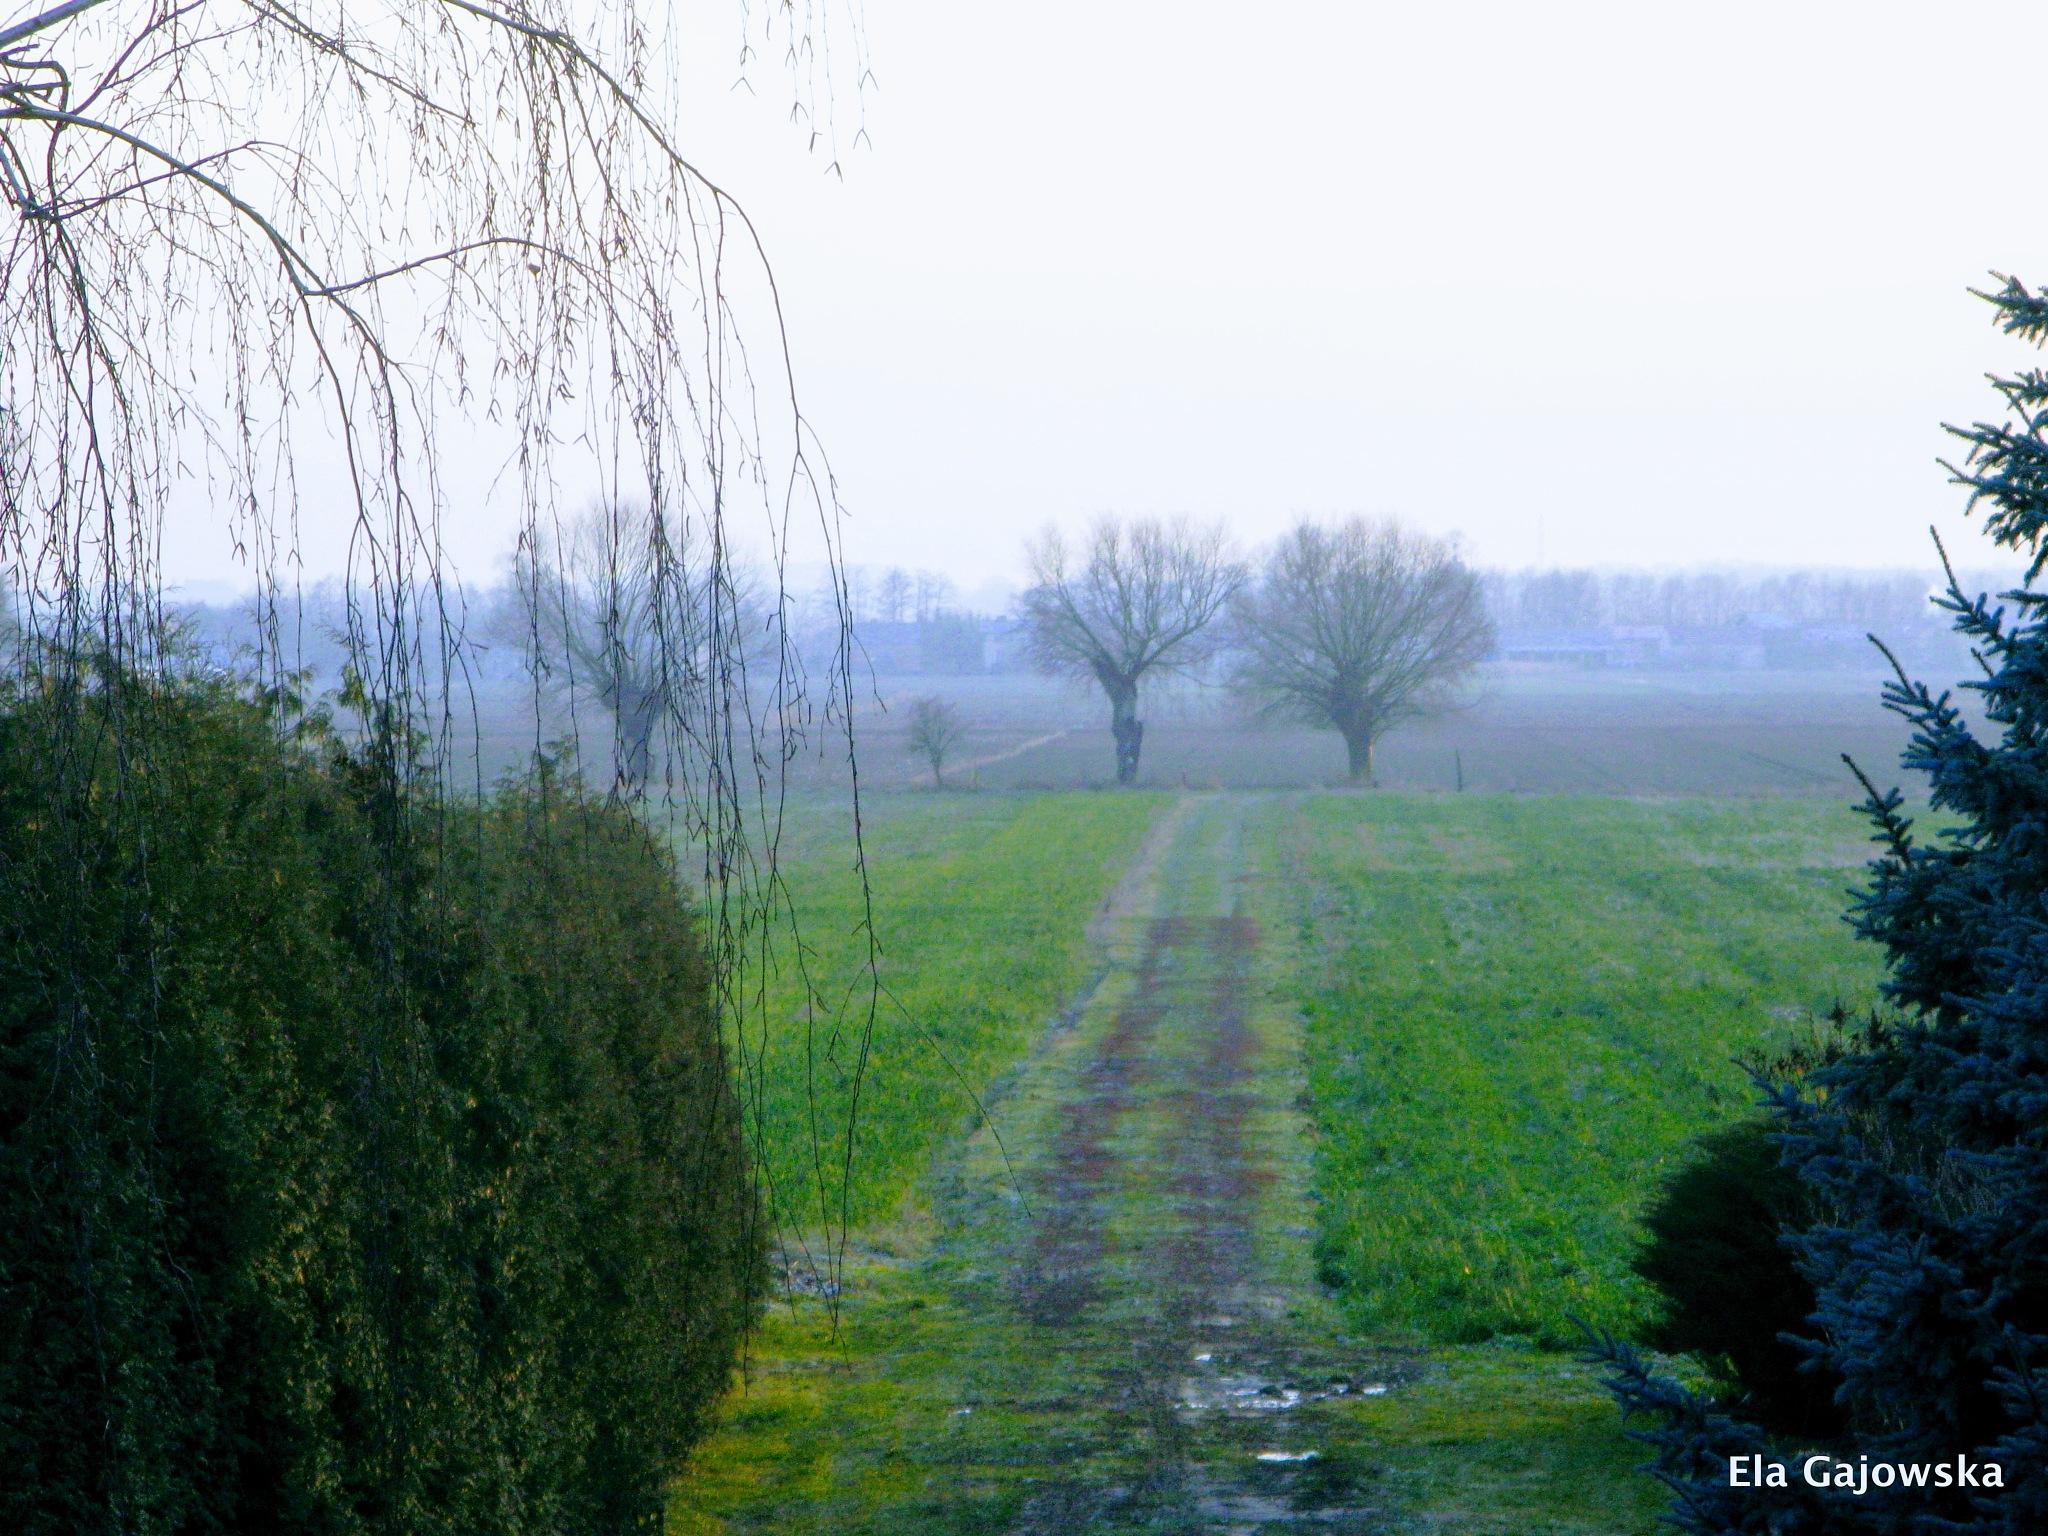 Countryside in December by Ela Gajowska